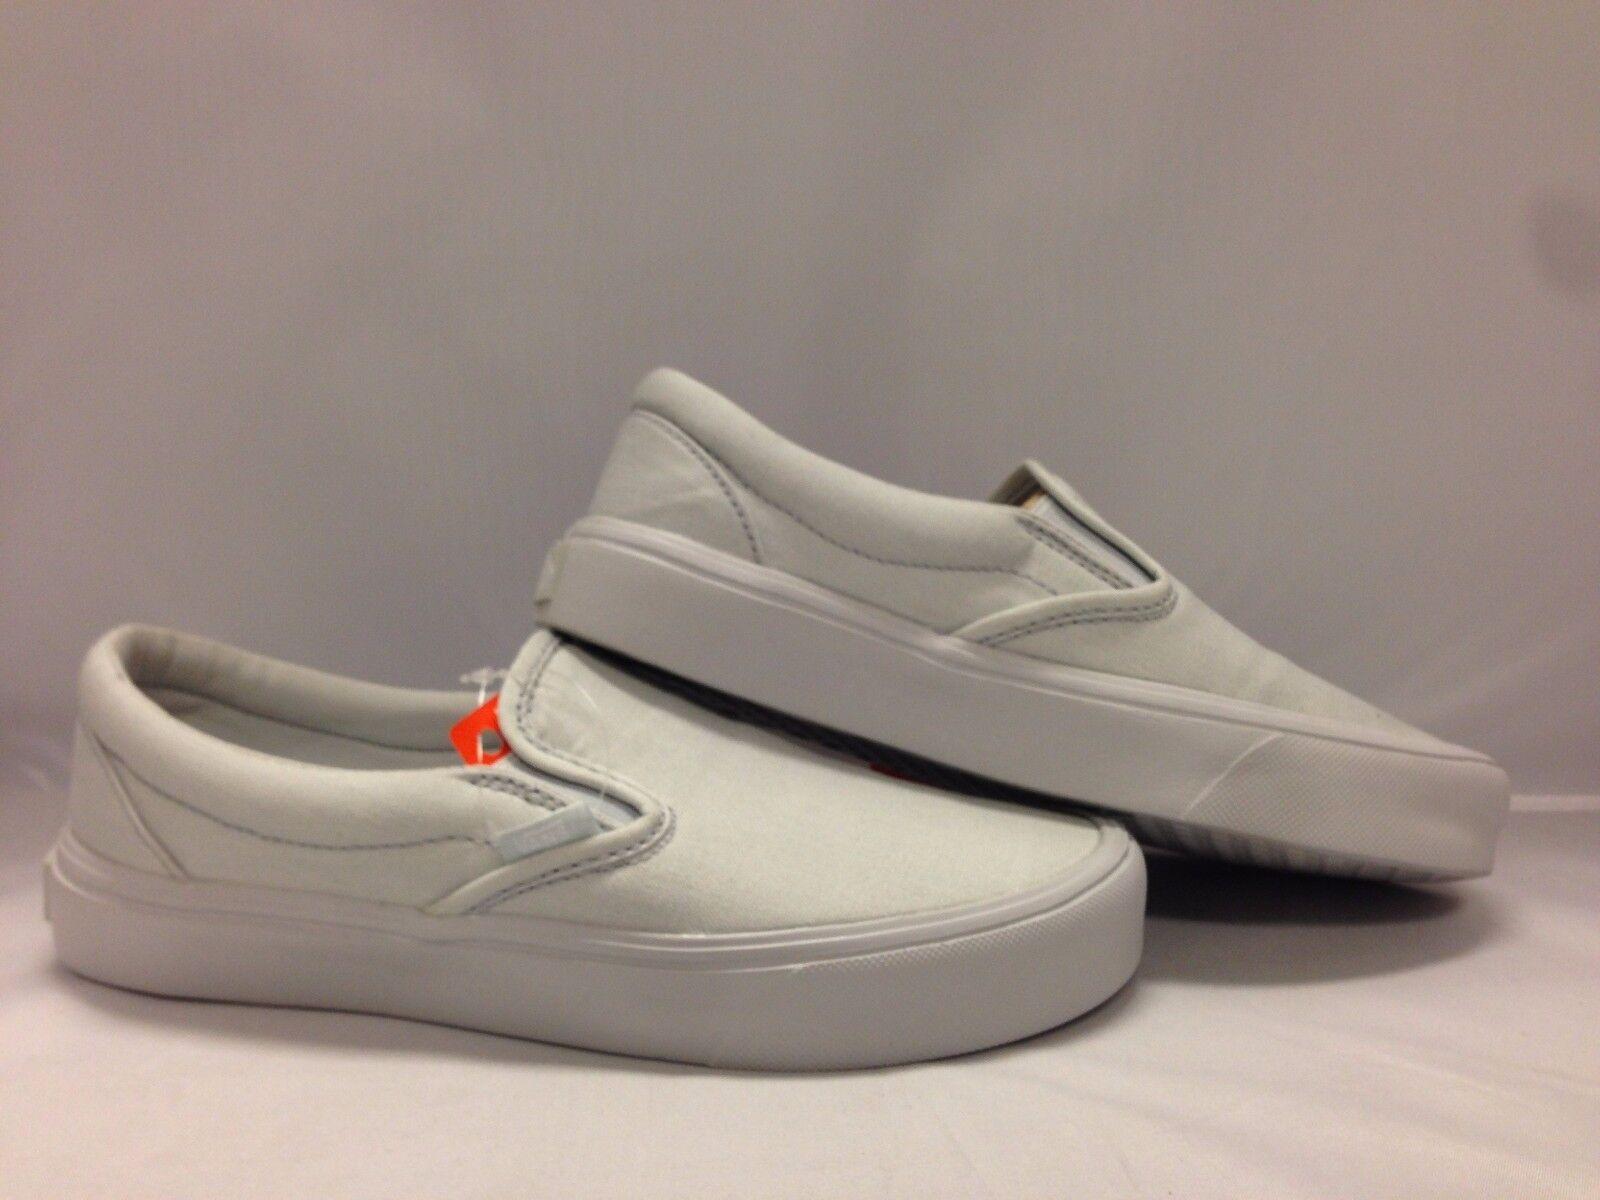 Vans Men's shoes Slip-On lite''--(Mono) Dawn bluee Dawn bluee